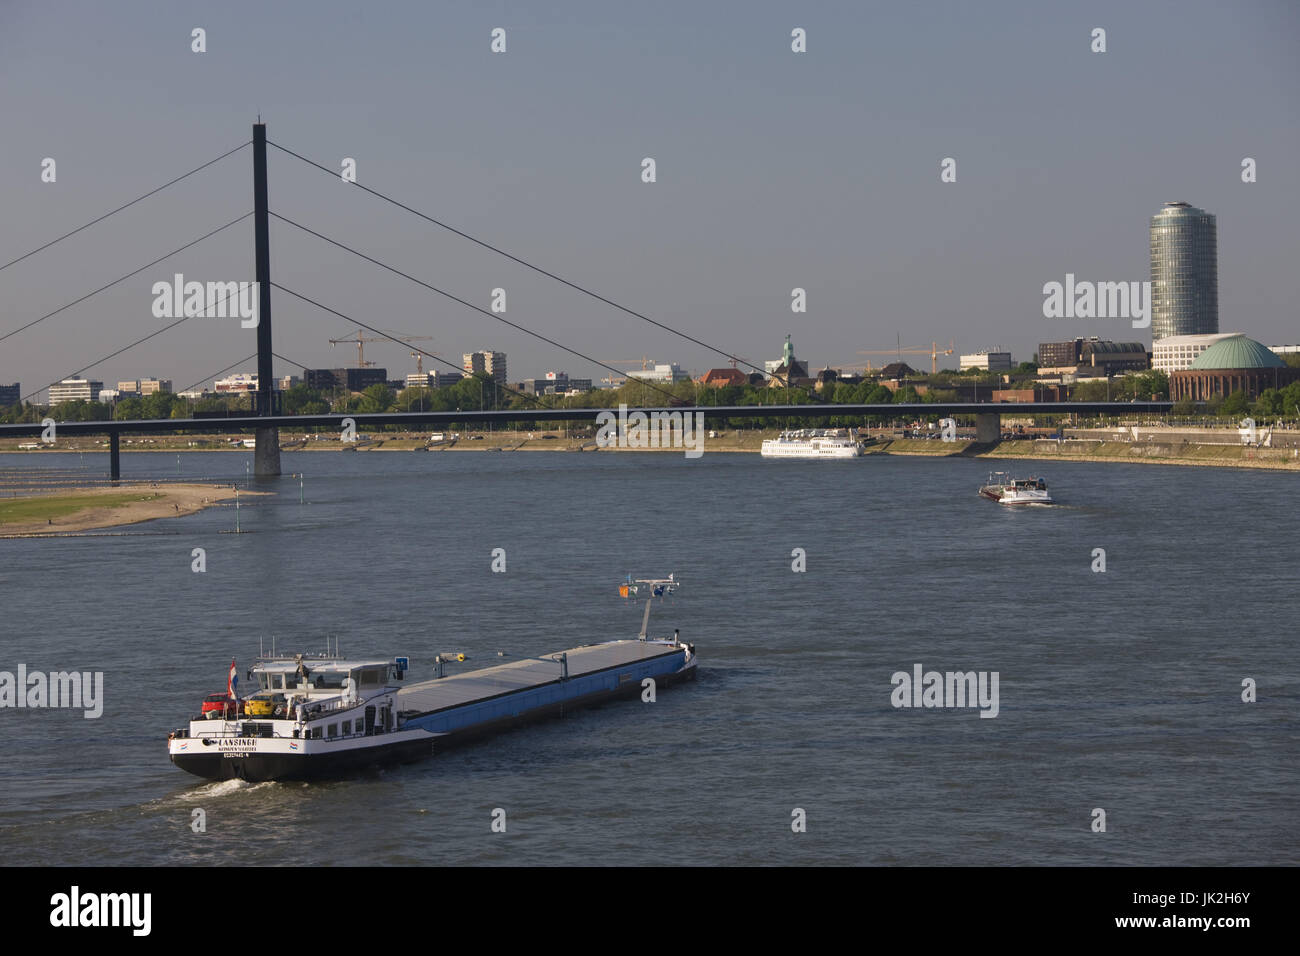 Germany, Nordrhein-Westfalen, Düsseldorf, Rheinkniebrücke, Rhein River, - Stock Image